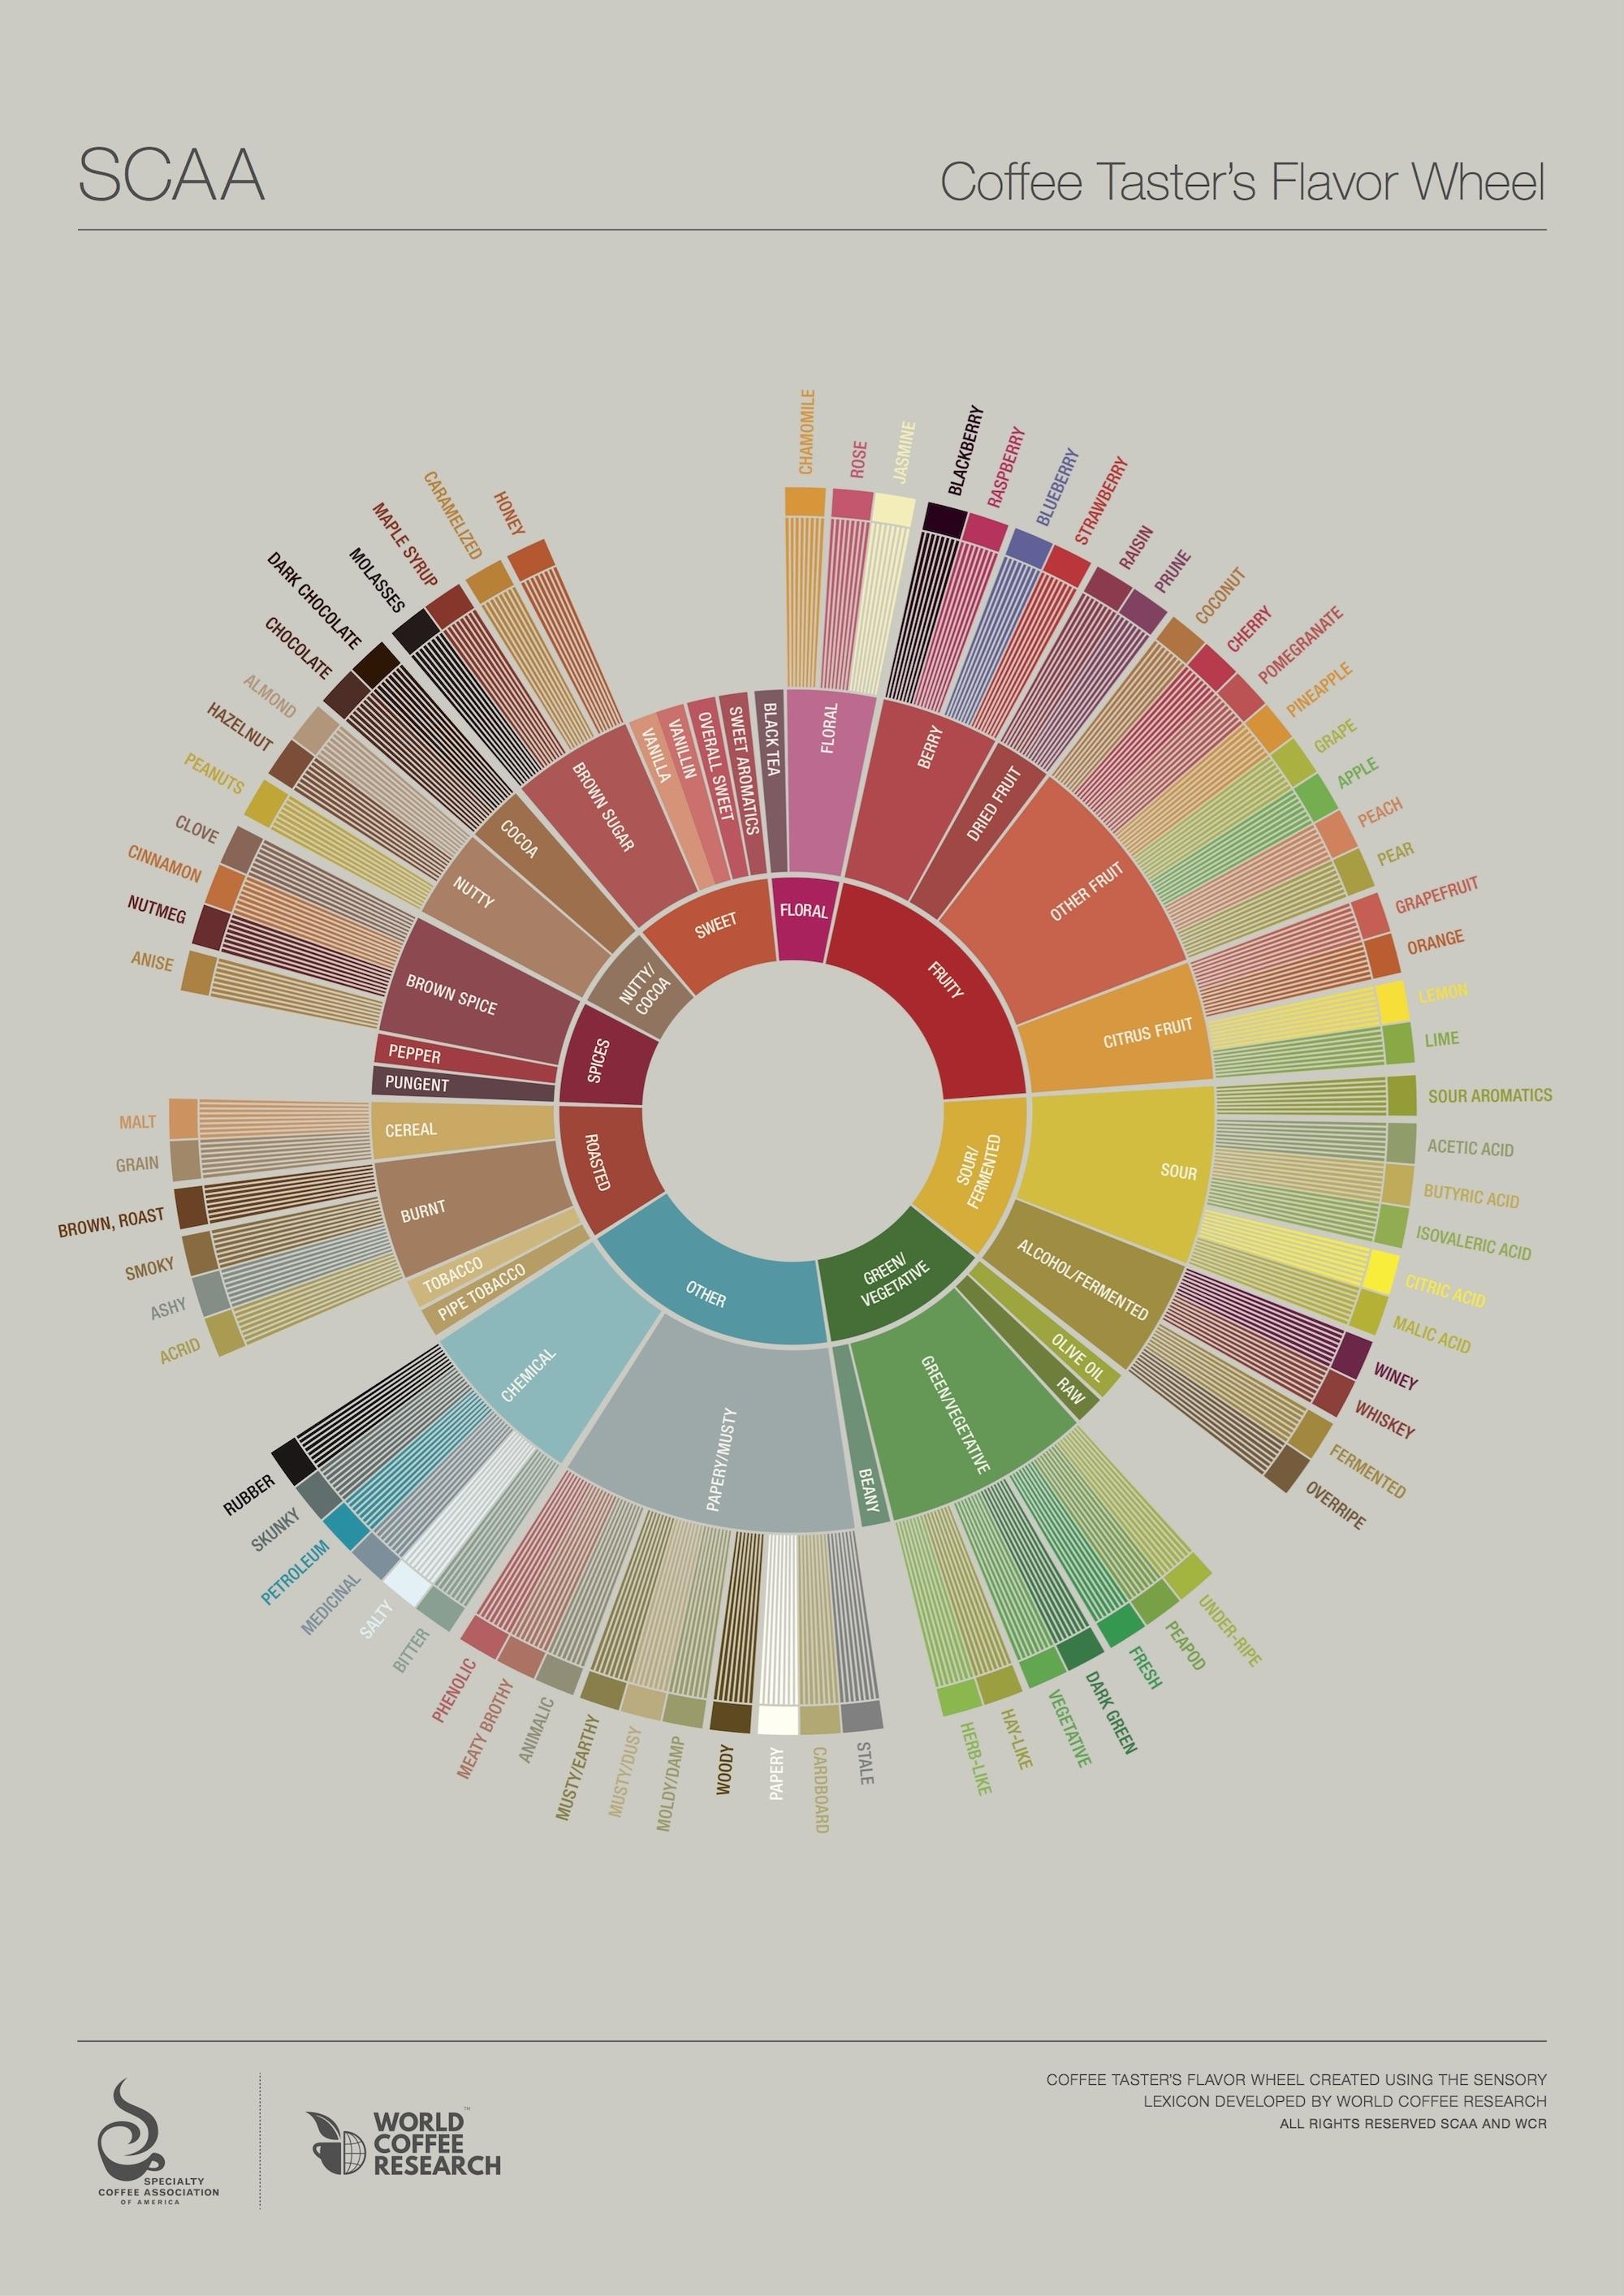 The Coffee Taster's Flavor Wheel